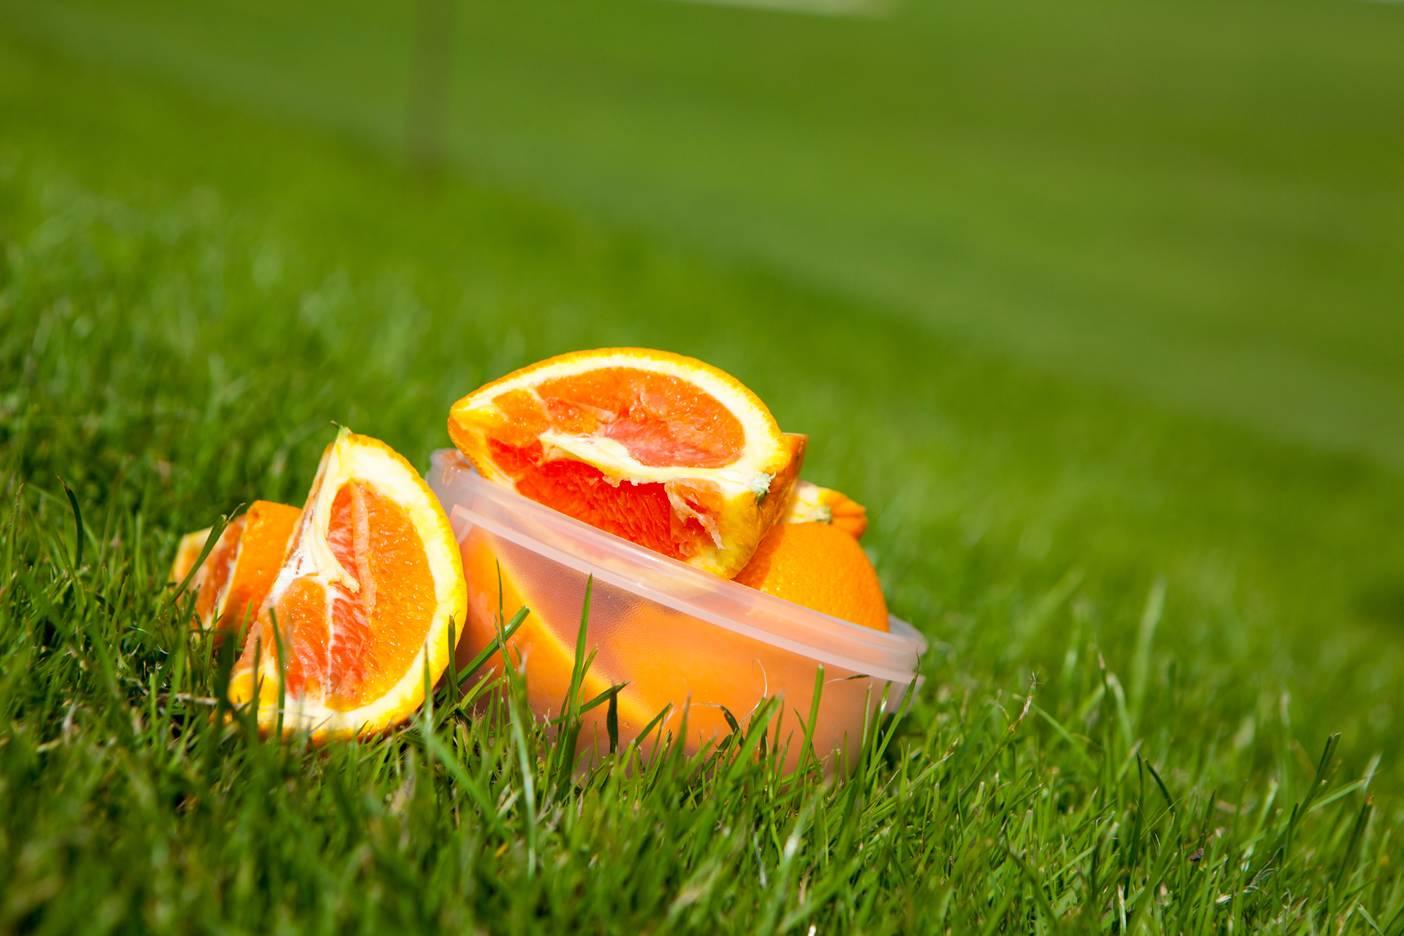 rsz_oranges_2.jpg